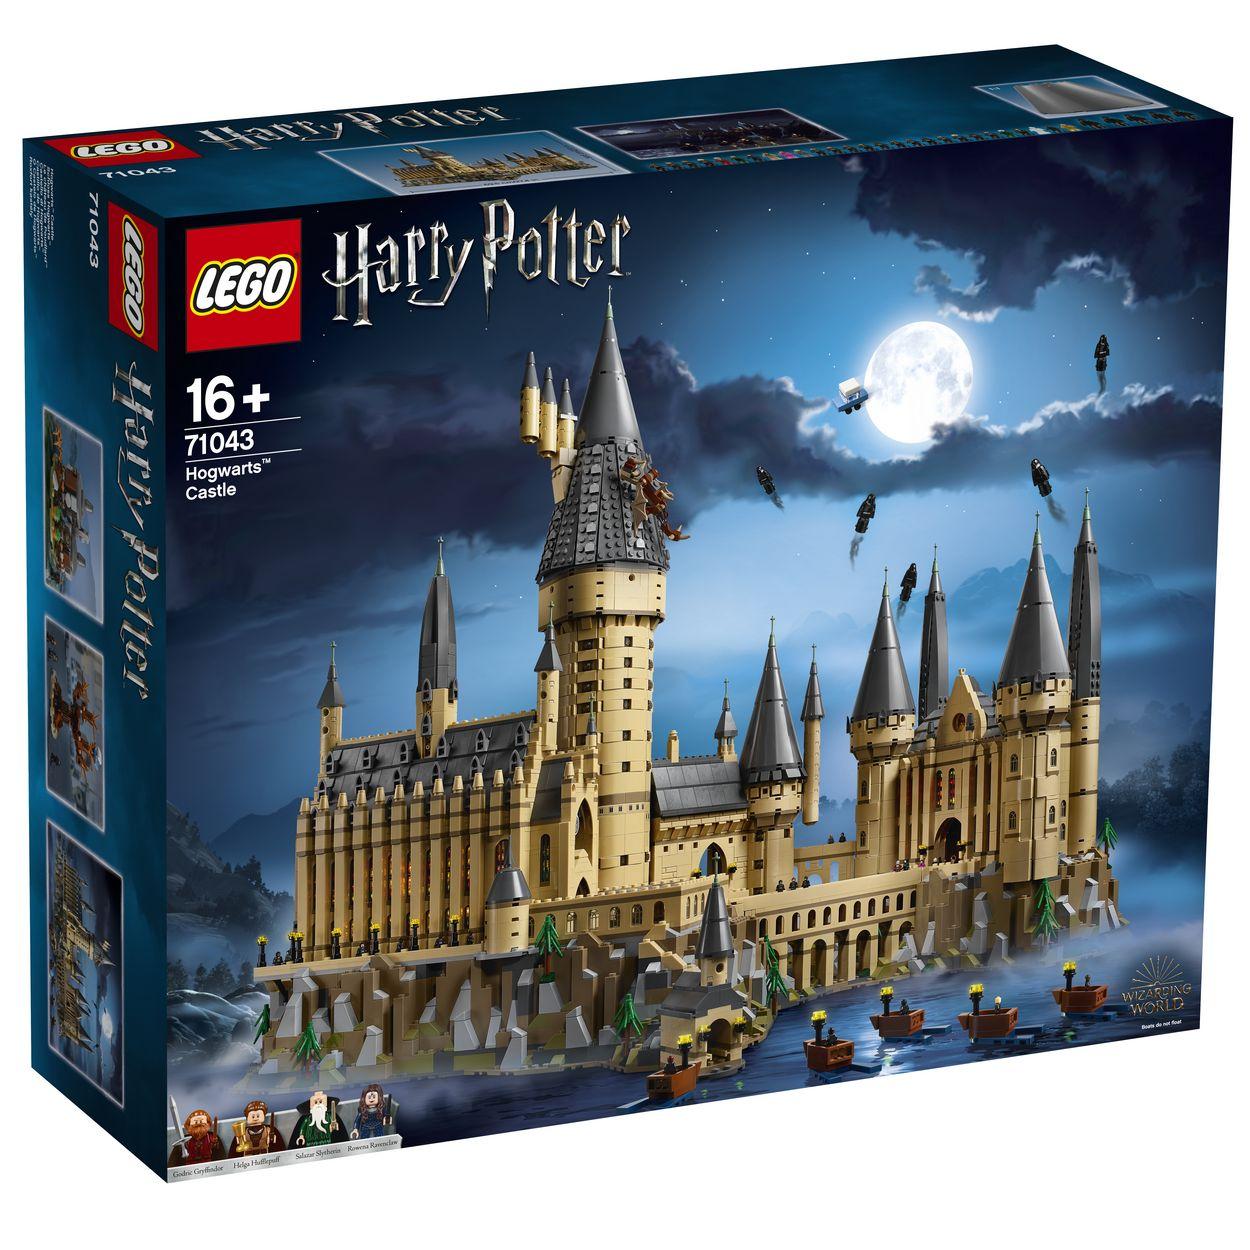 CASTELLO DI HOGWARTS LEGO HARR